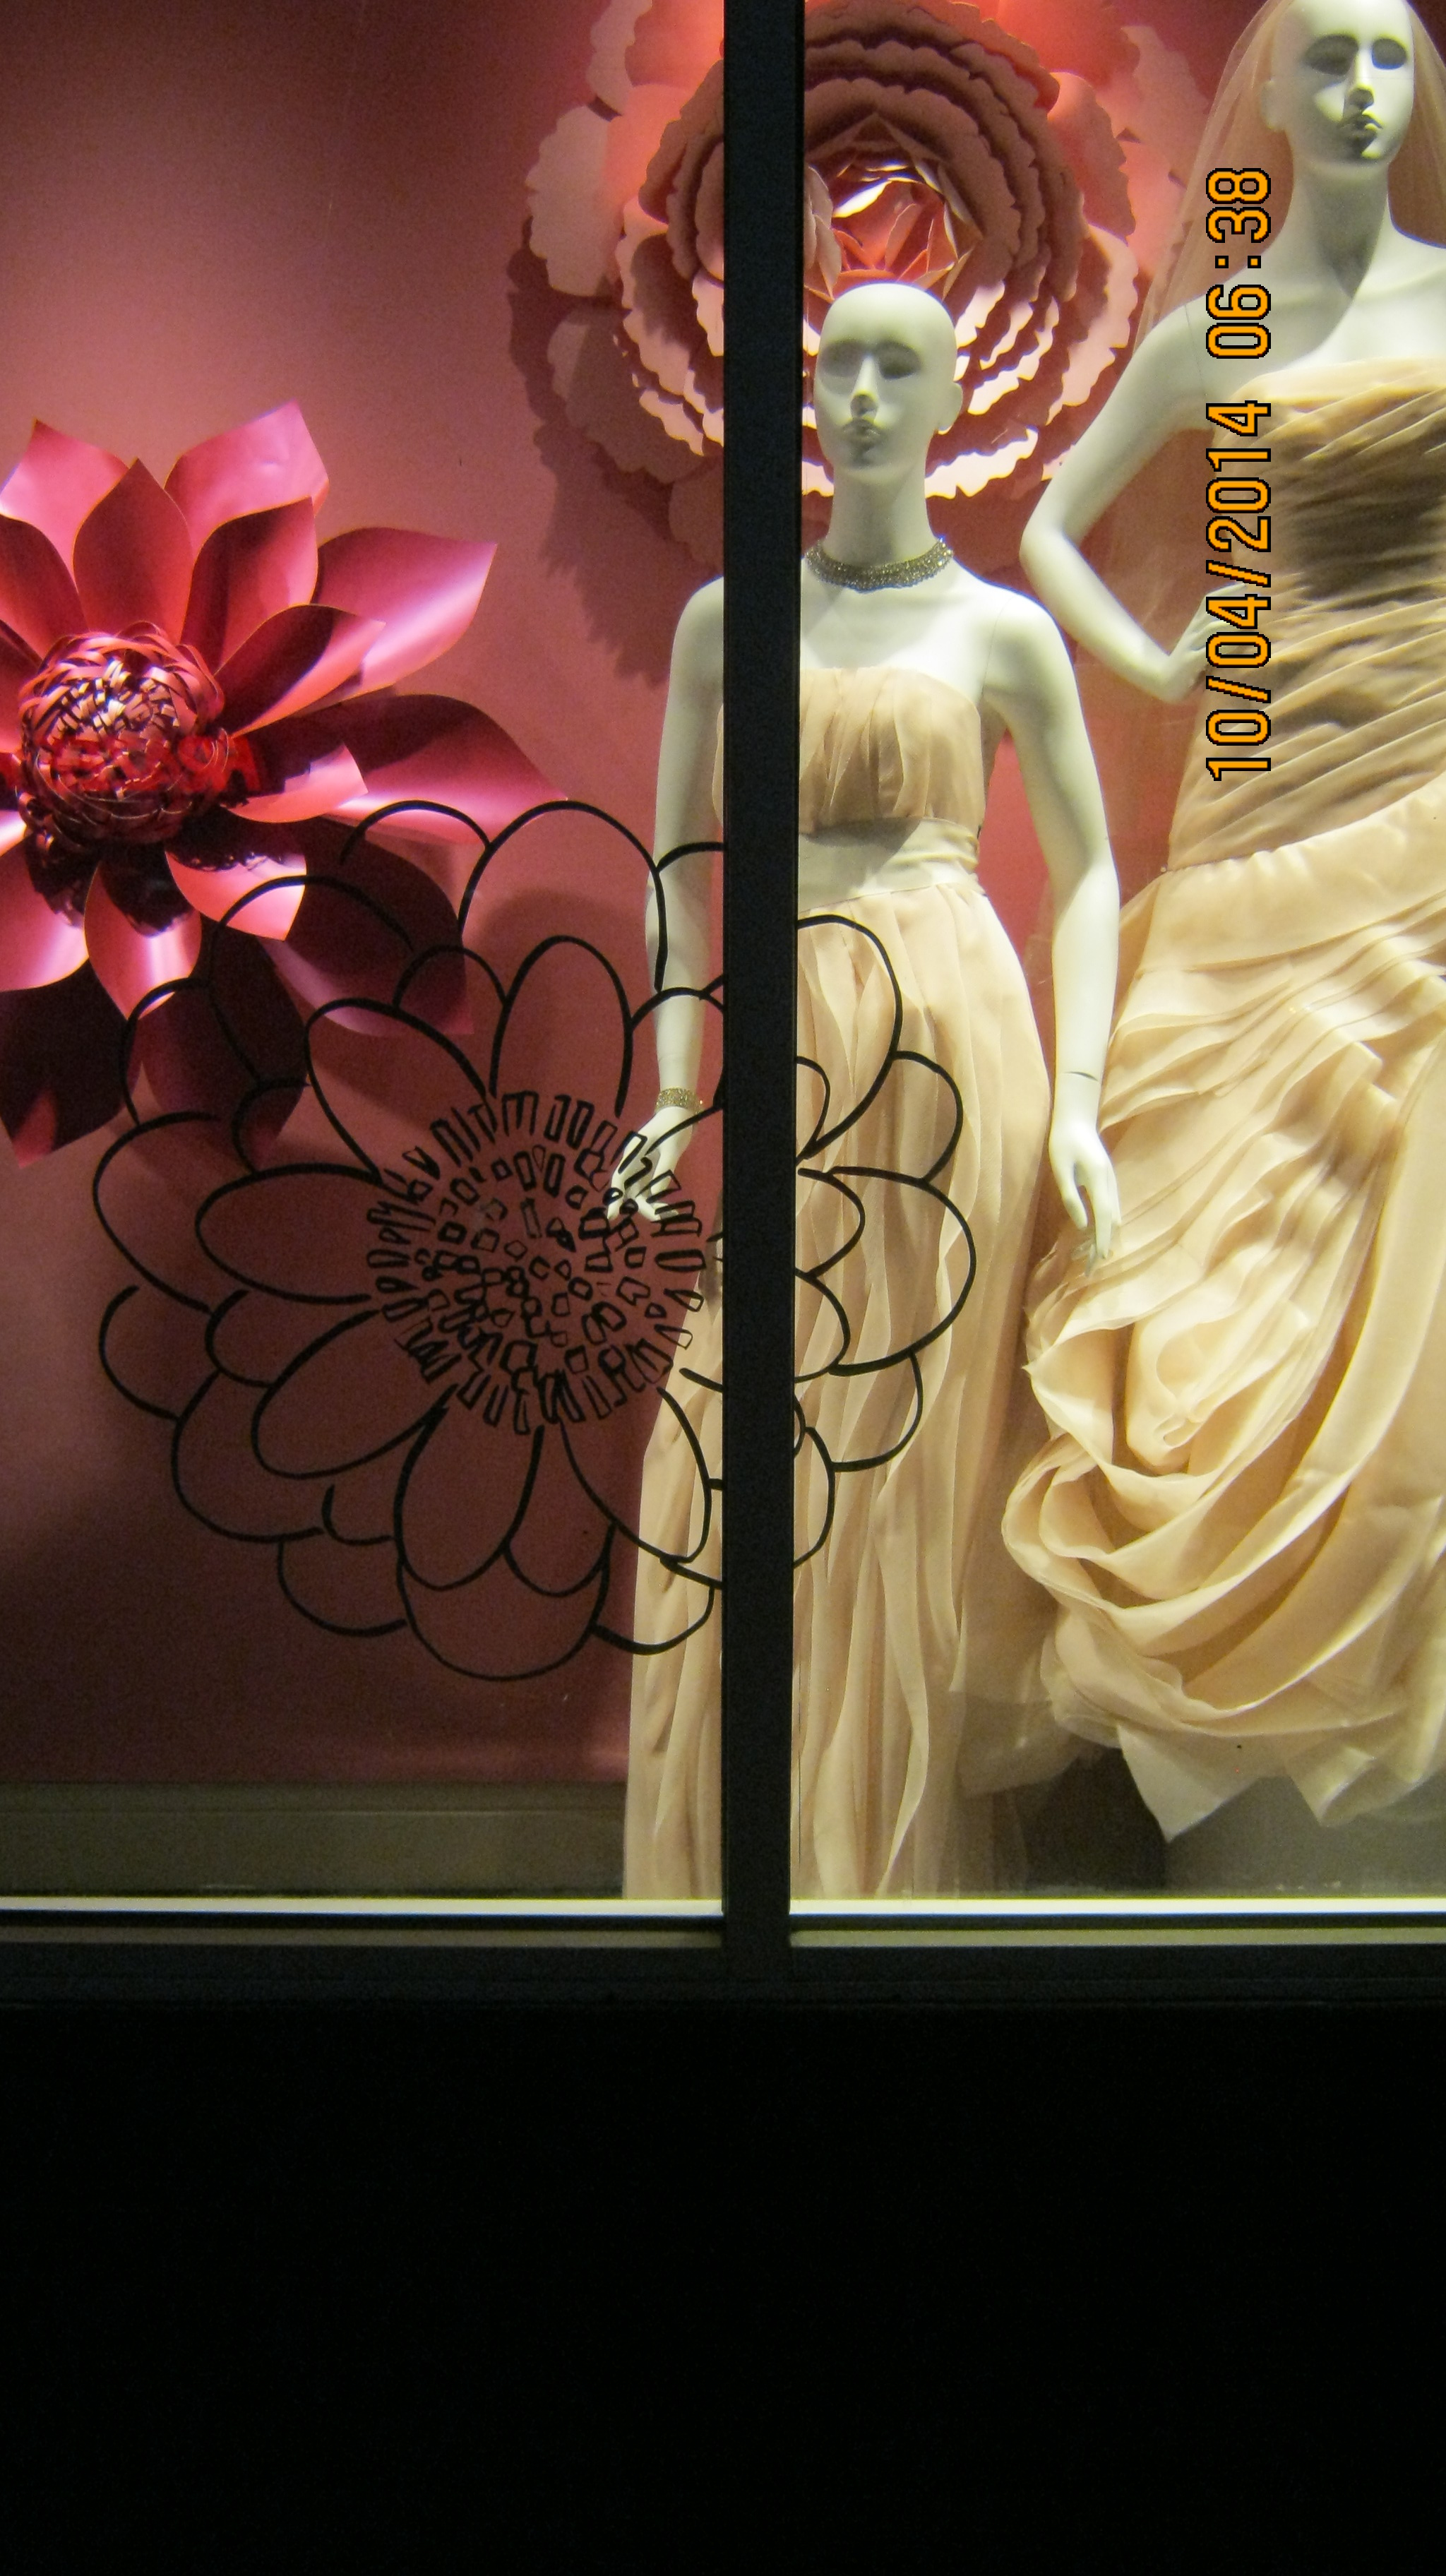 David's Bridal window display 2